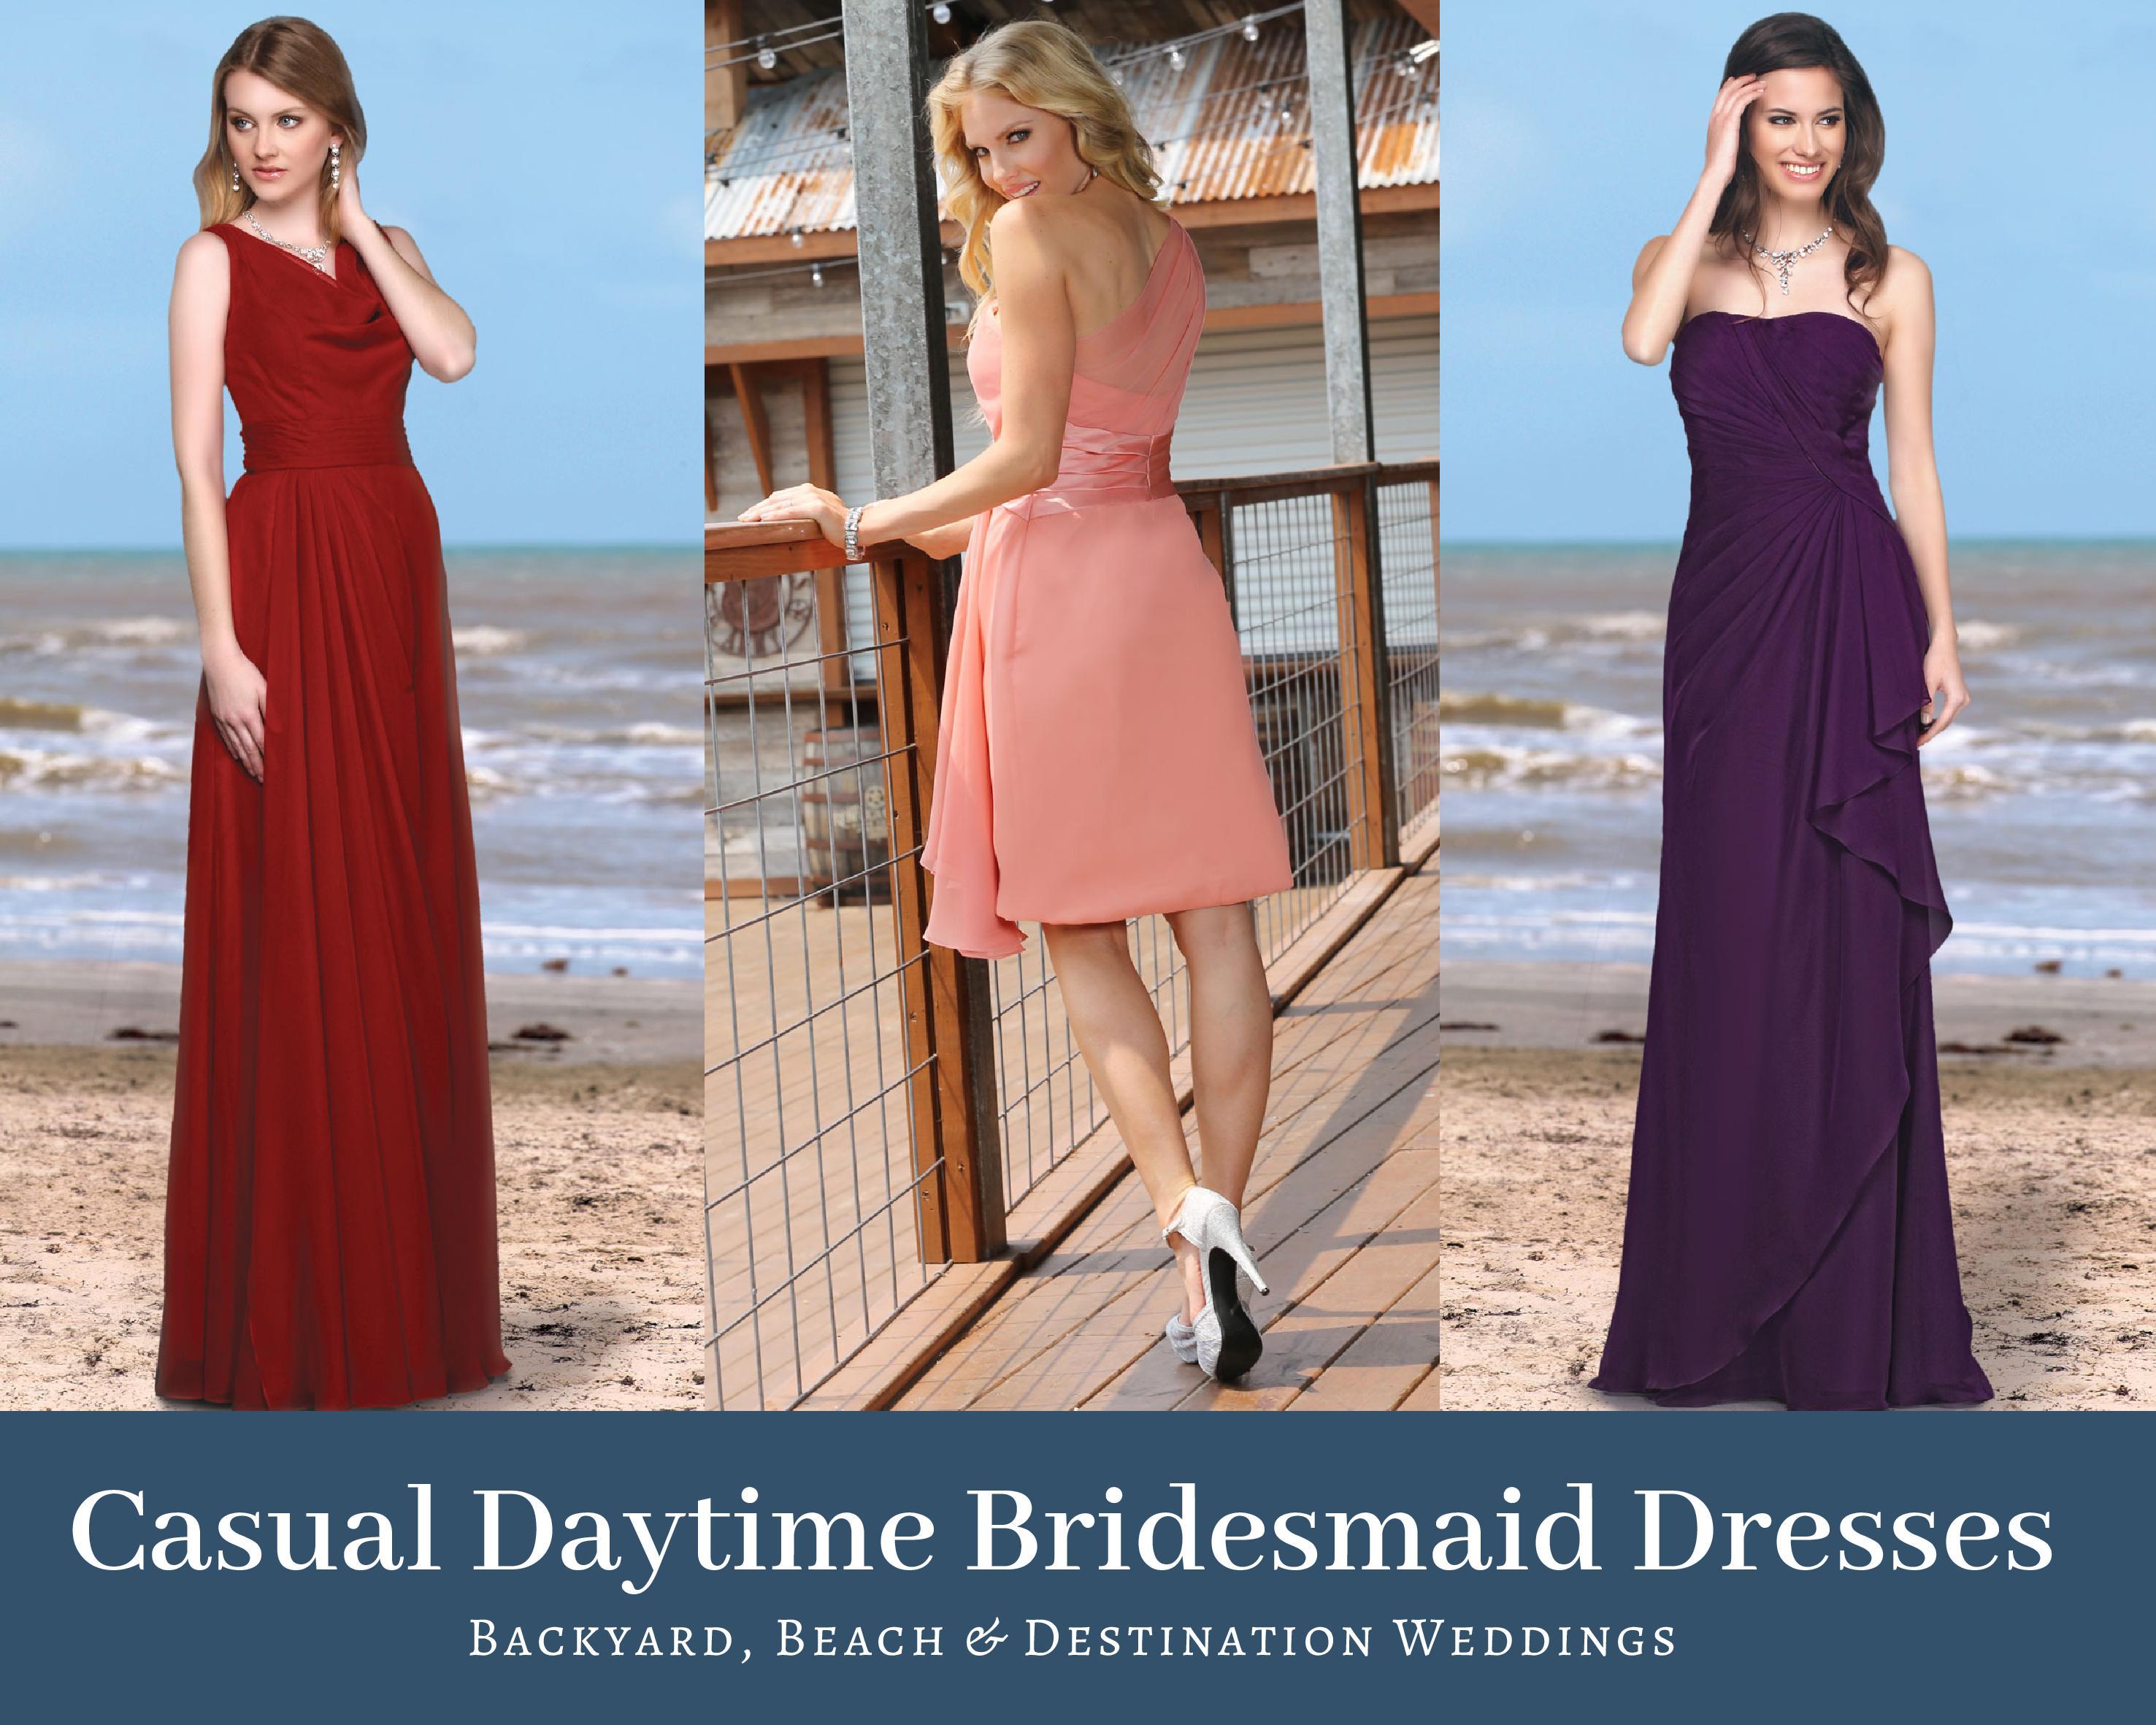 30 Casual Daytime Bridesmaids Dresses For Backyard Beach Destination